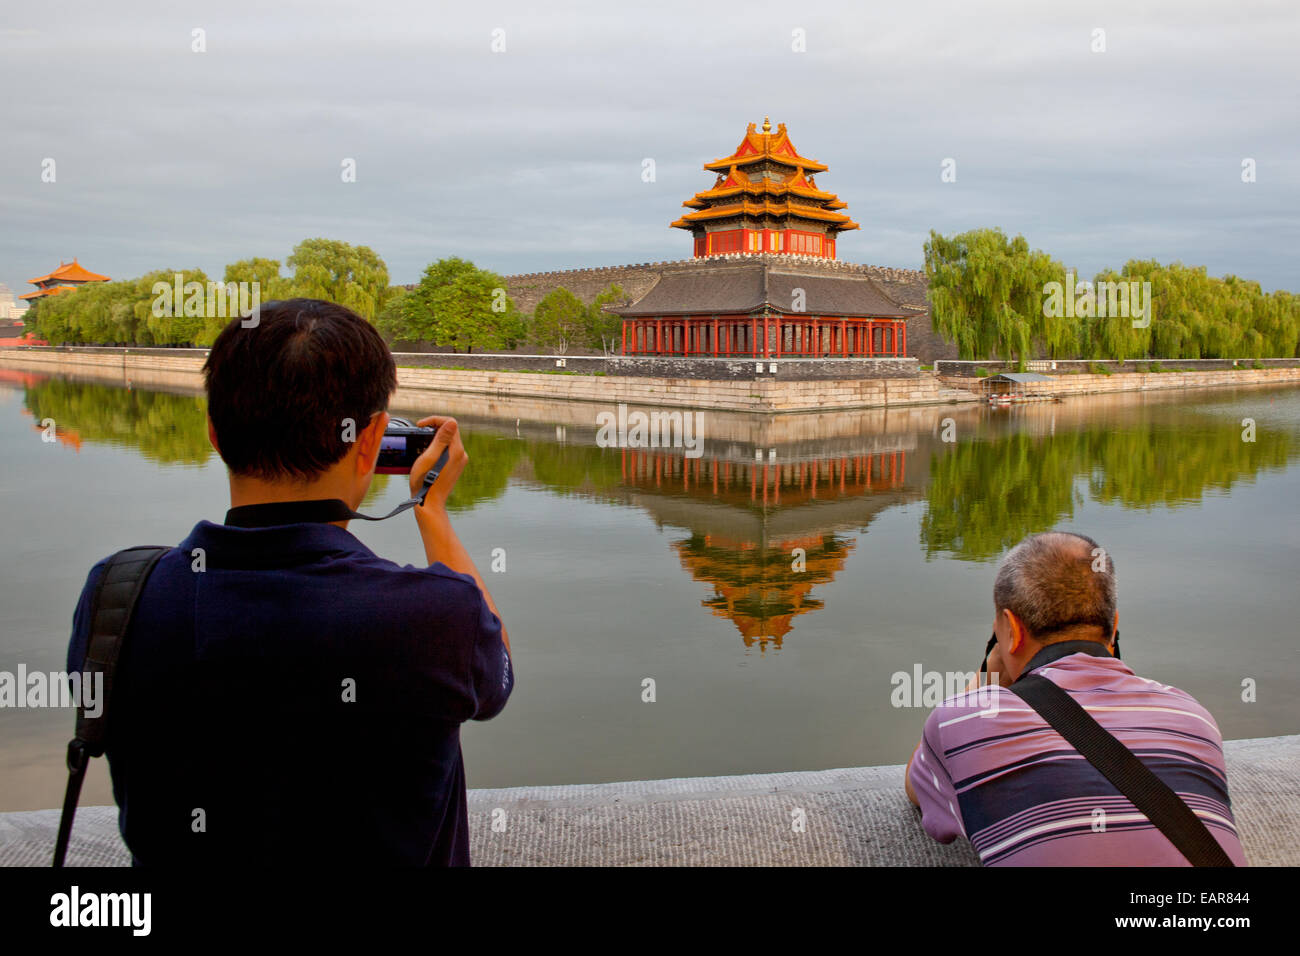 China, Verbotene Stadt, Tourismus, Urlaub, Pagode, Wasser, Fotografen, Buddhismus, Capital Cities, chinesische Kultur, Stockbild